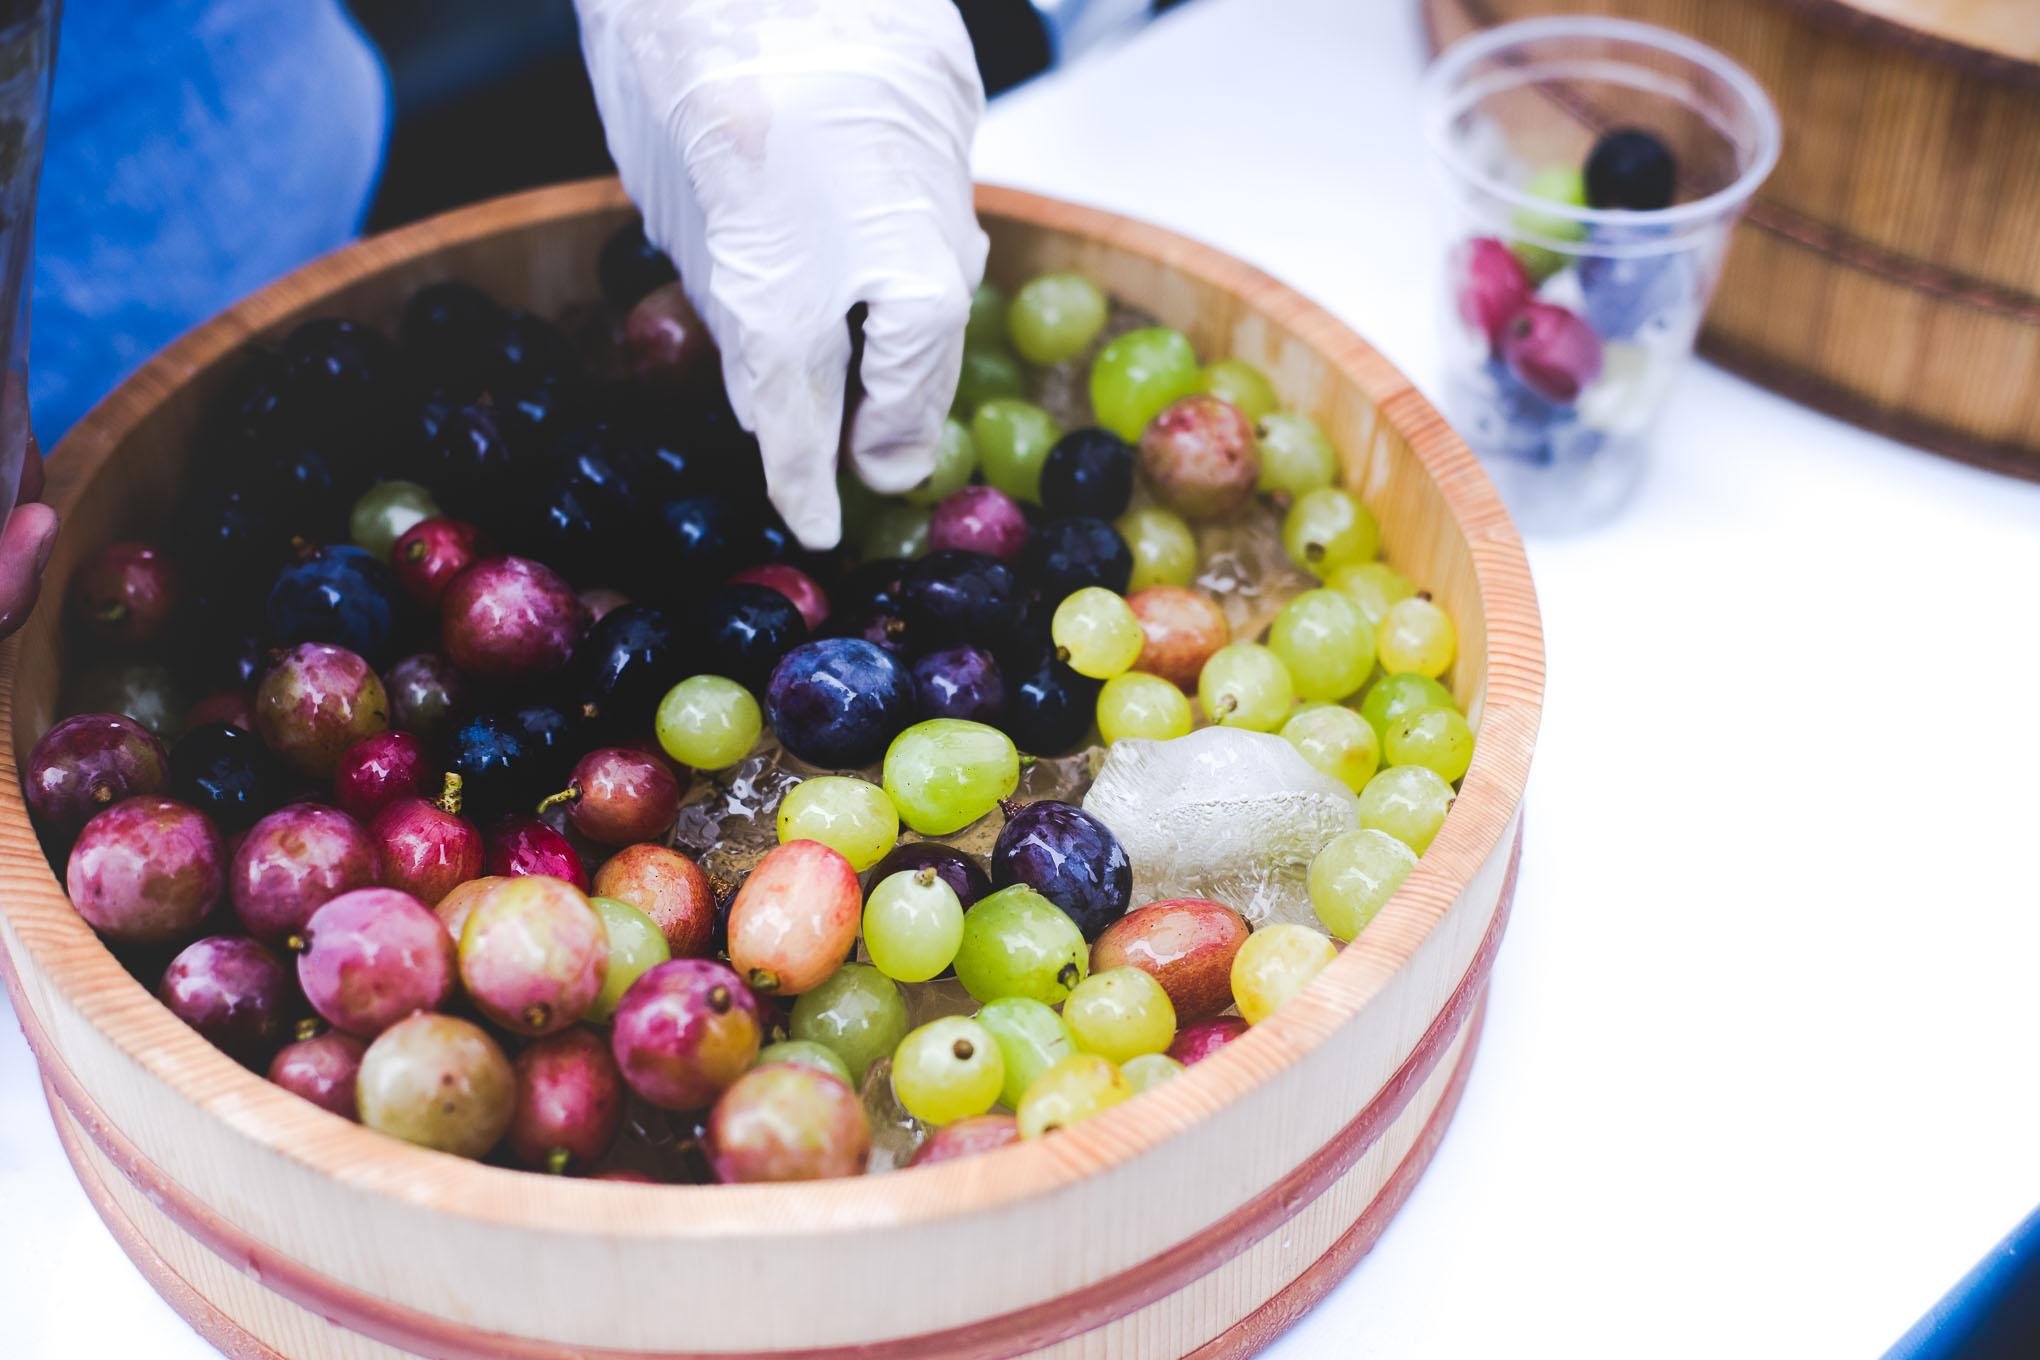 grapes-produce-of-awashi-3